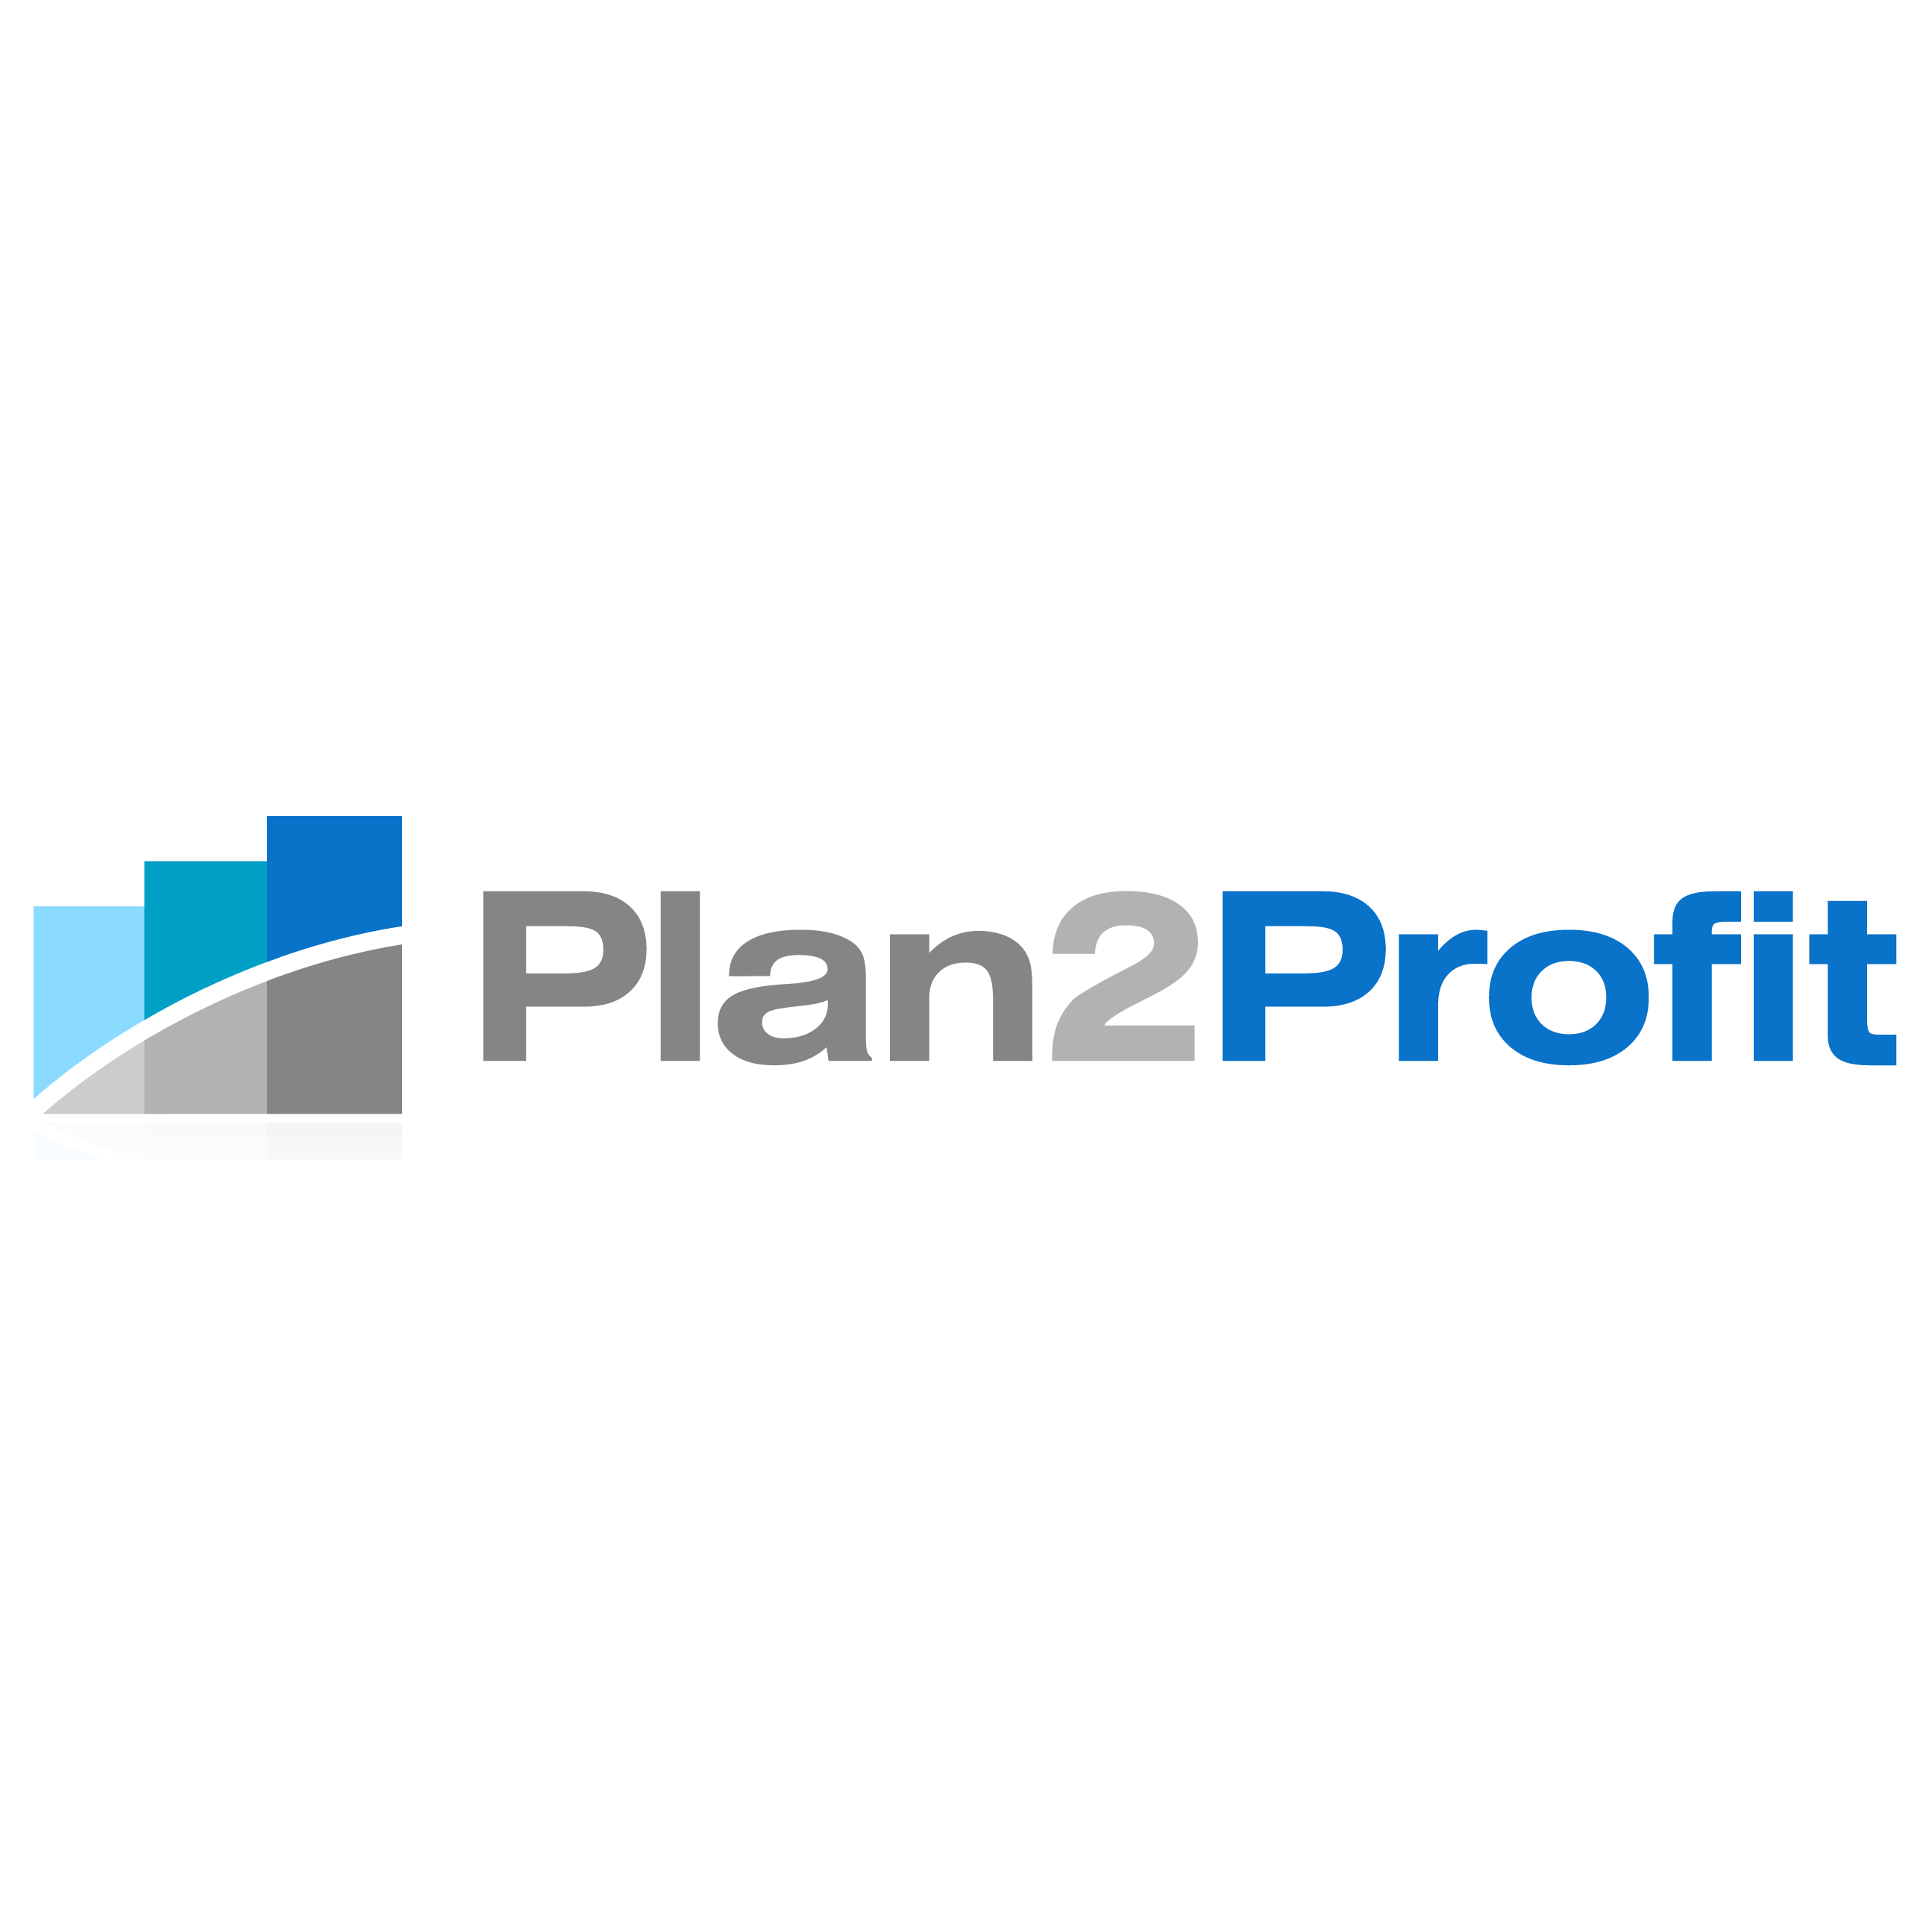 Plan2Profit Marketing